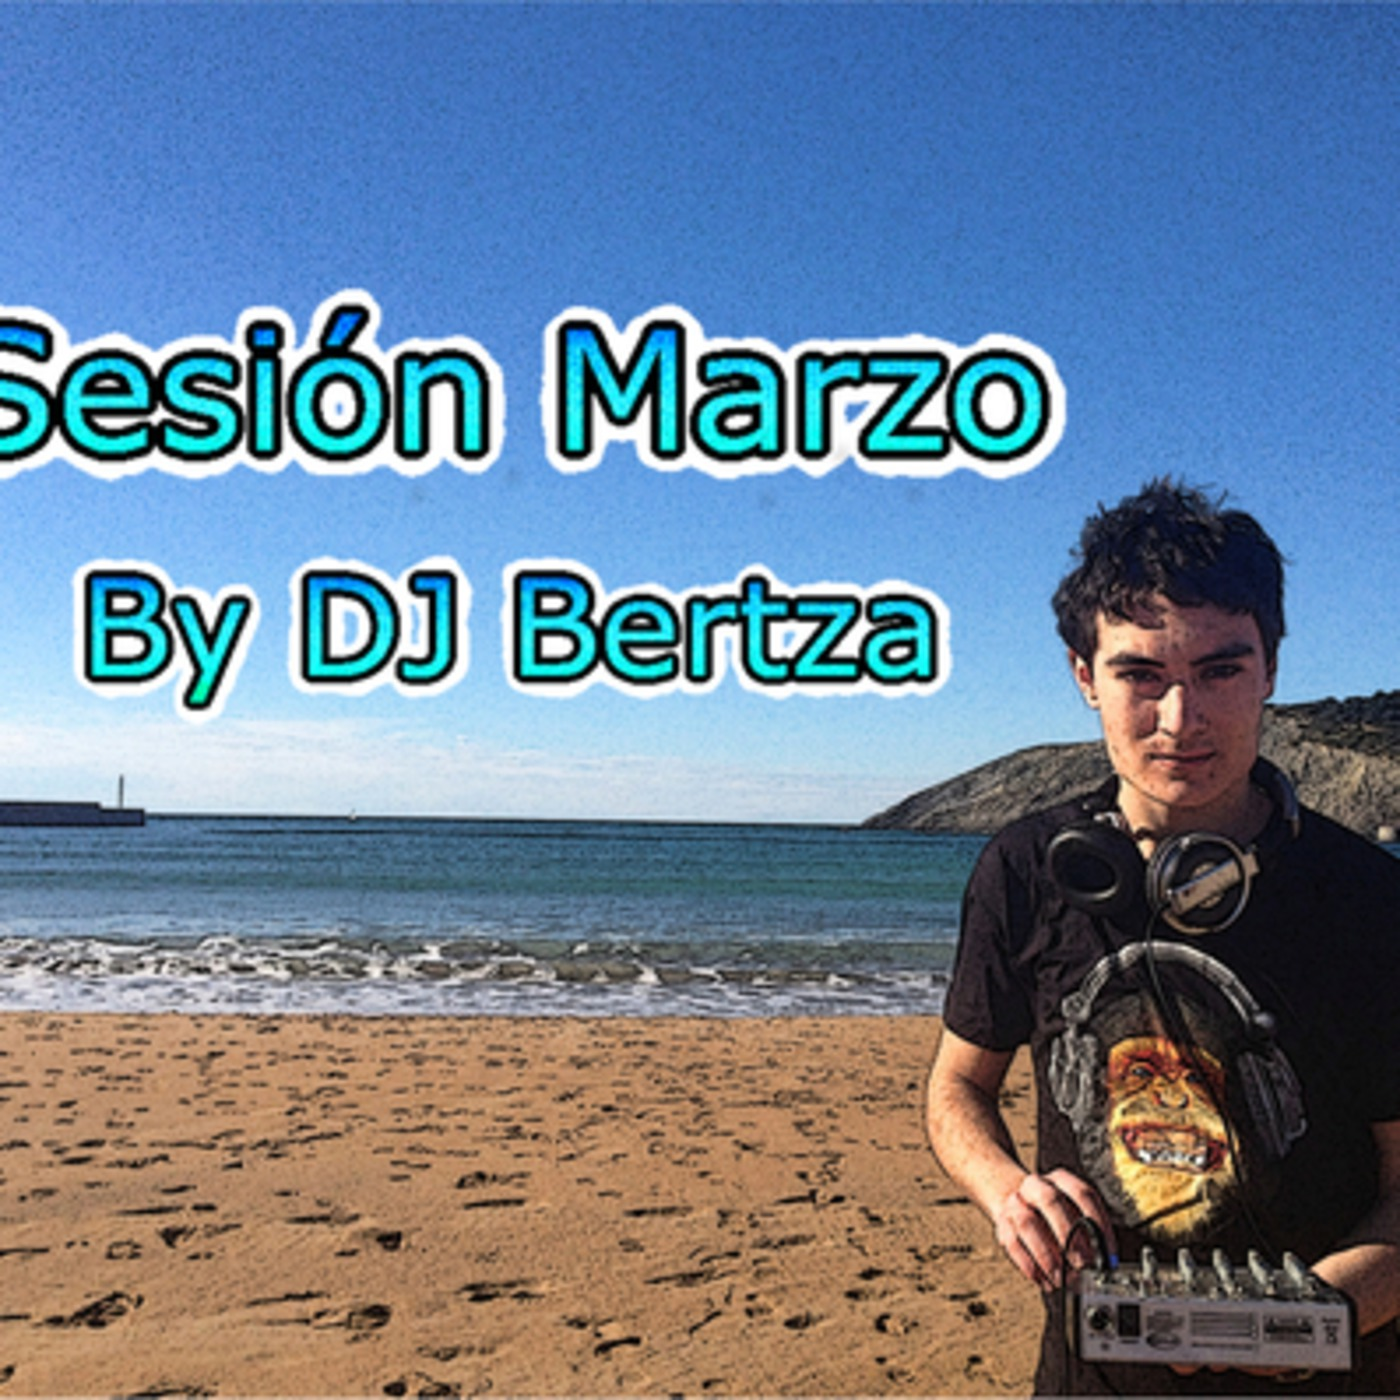 Sesión De Marzo- DJ Bertza